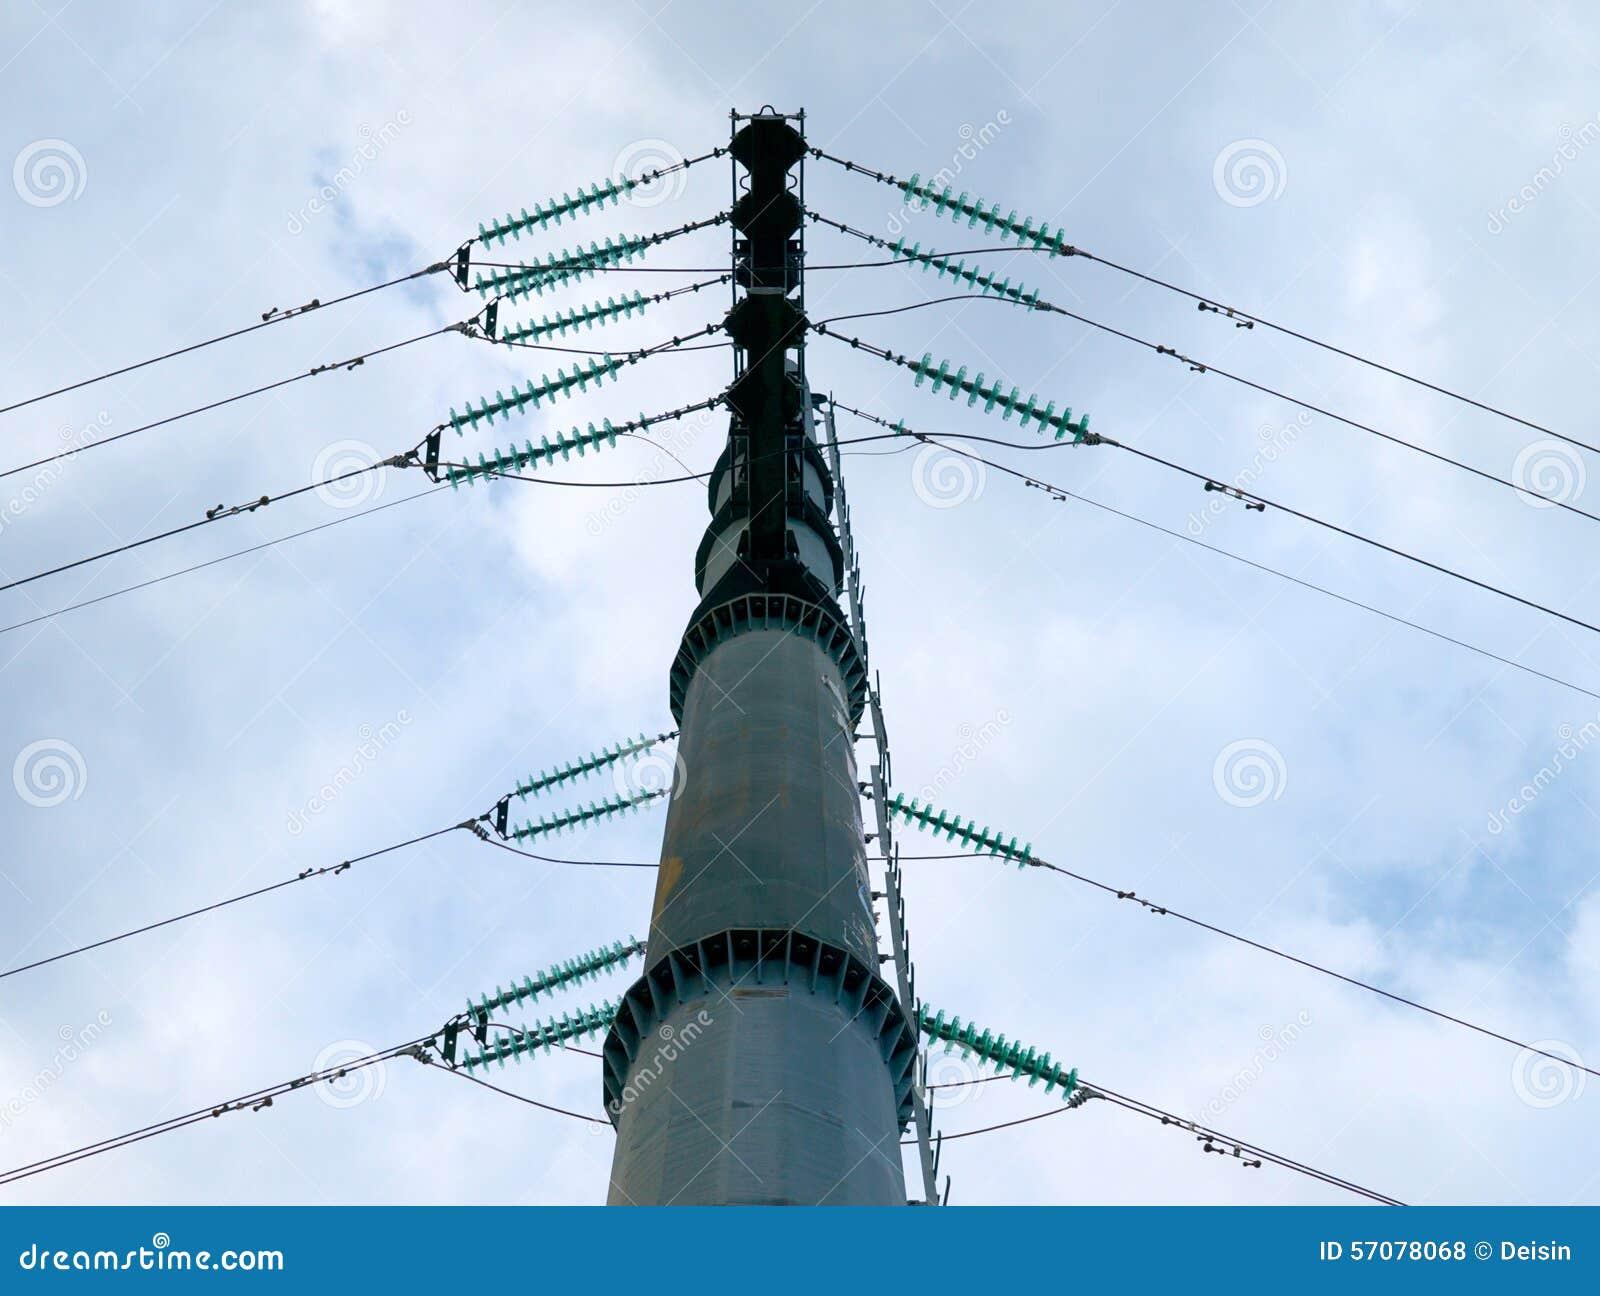 High Voltage Transmission Line Cable : High voltage transmission line stock photo image